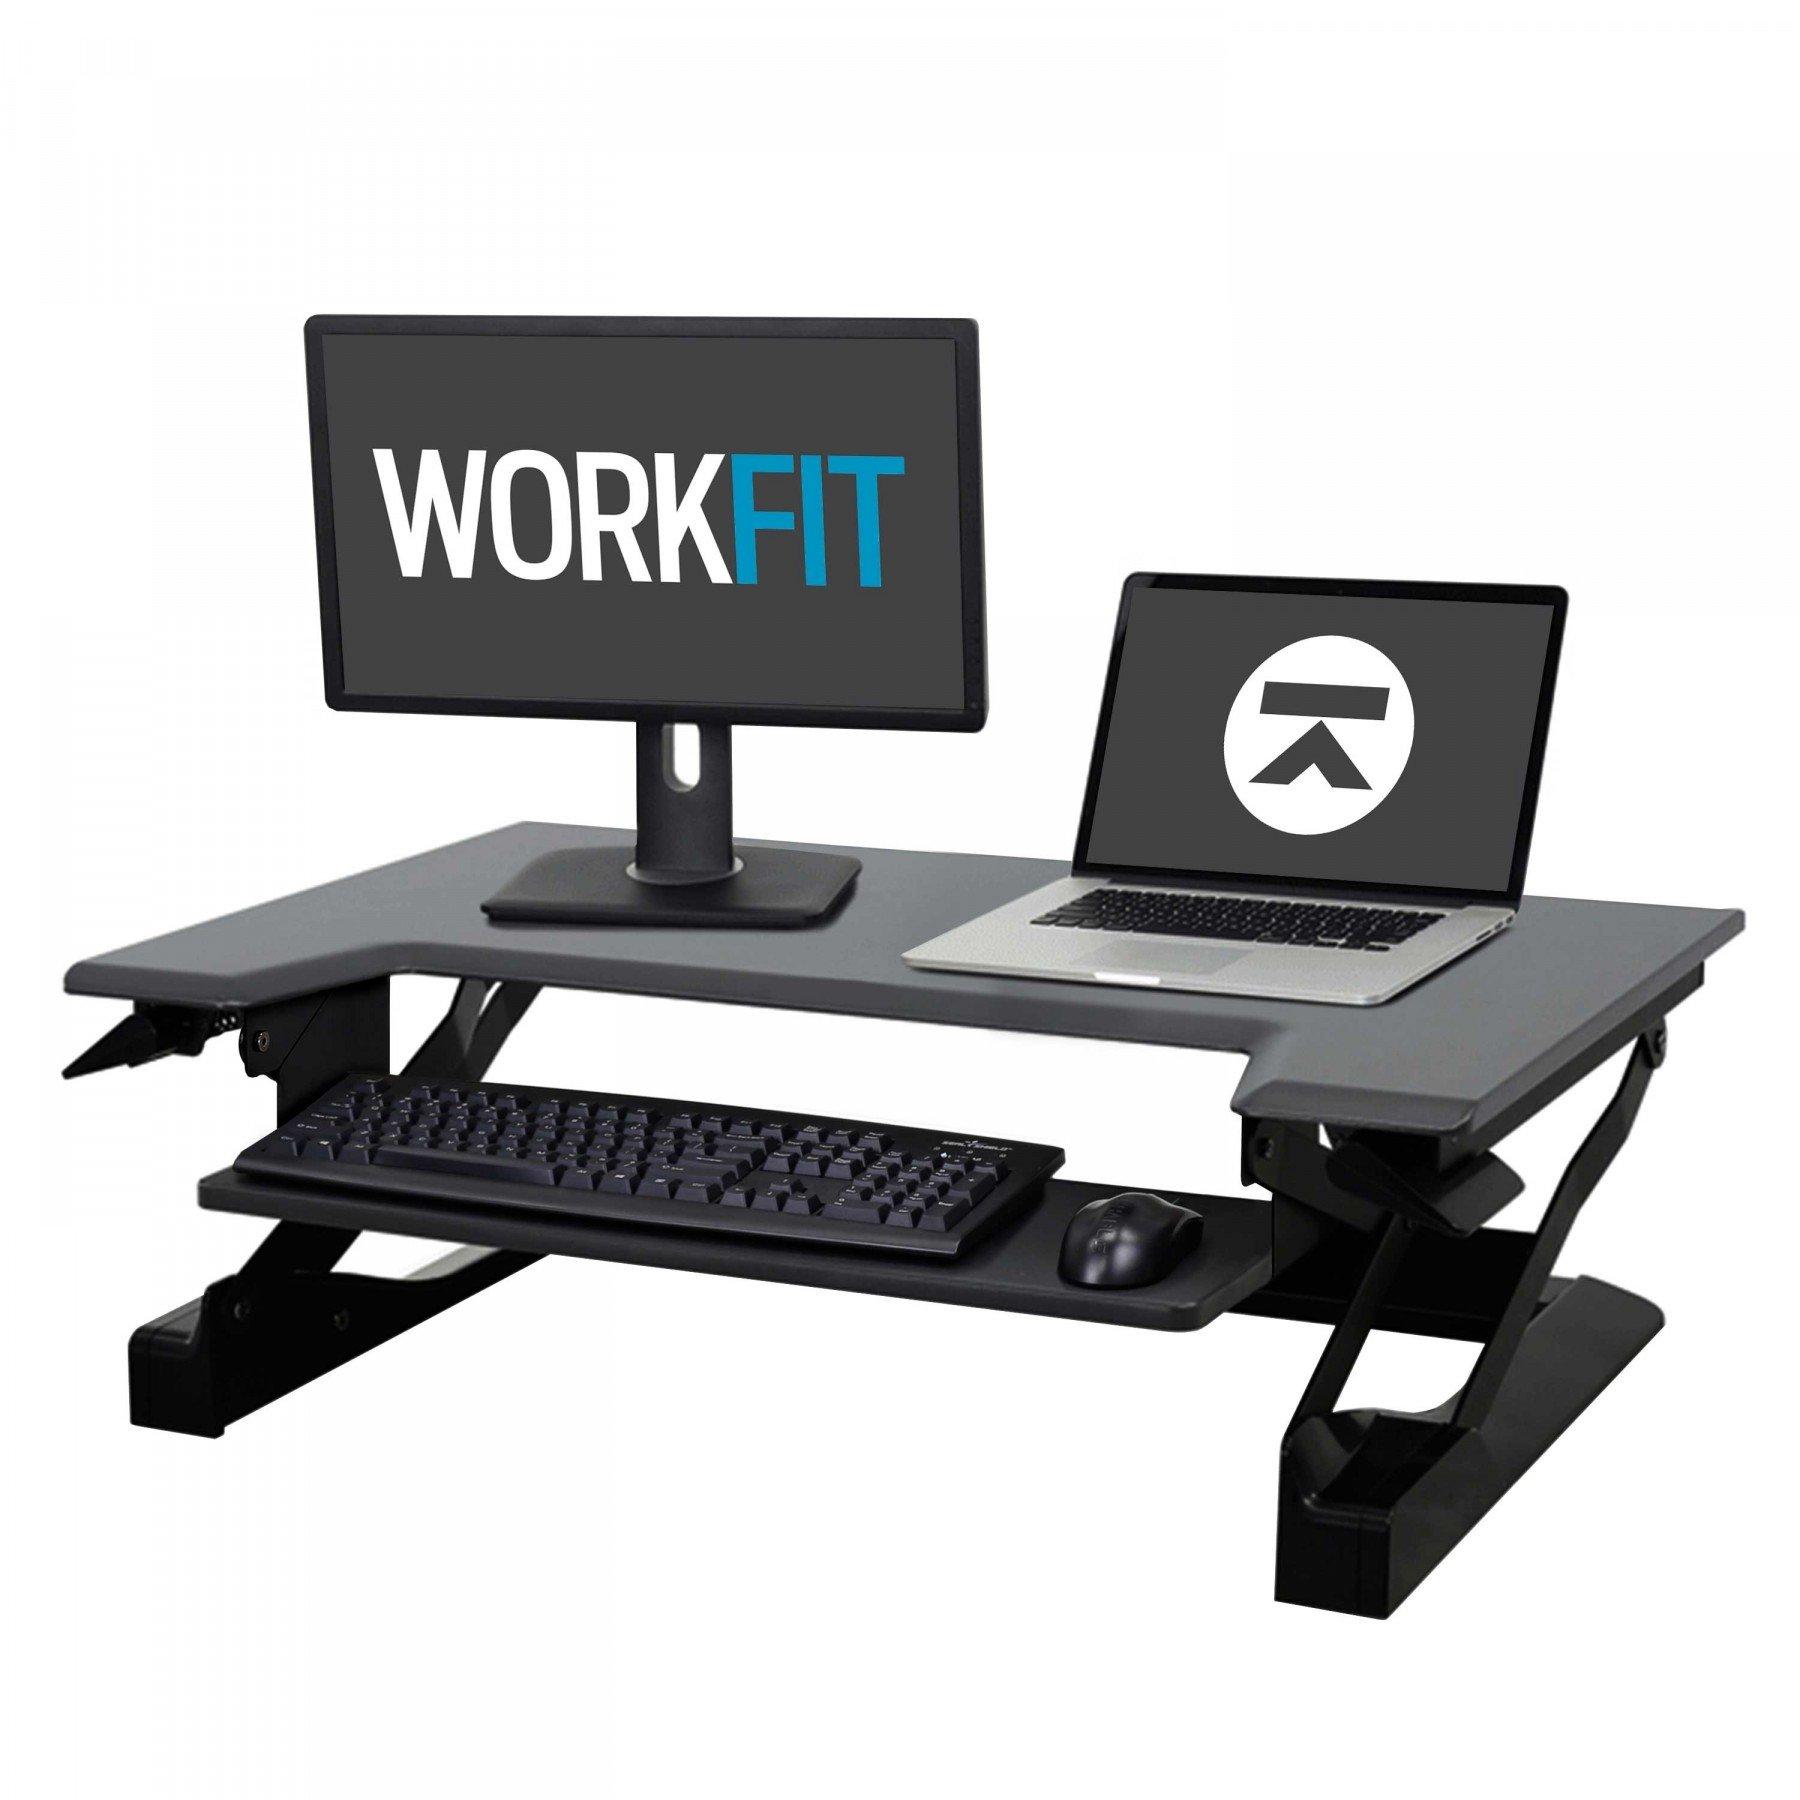 WorkFit-T Sit-Stand Desk Converter